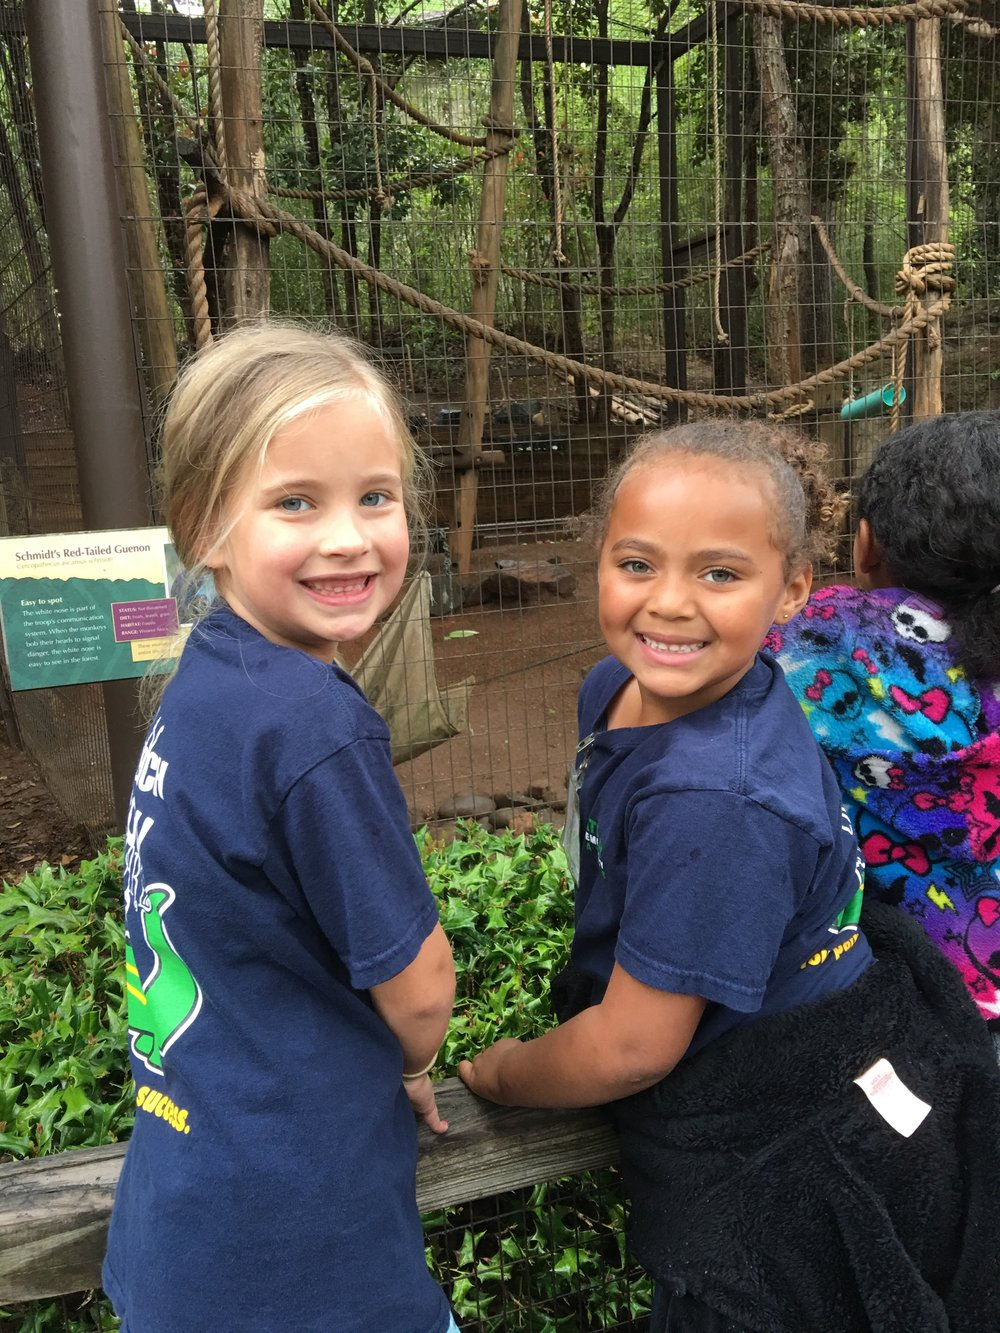 Quinn's field trip to the zoo